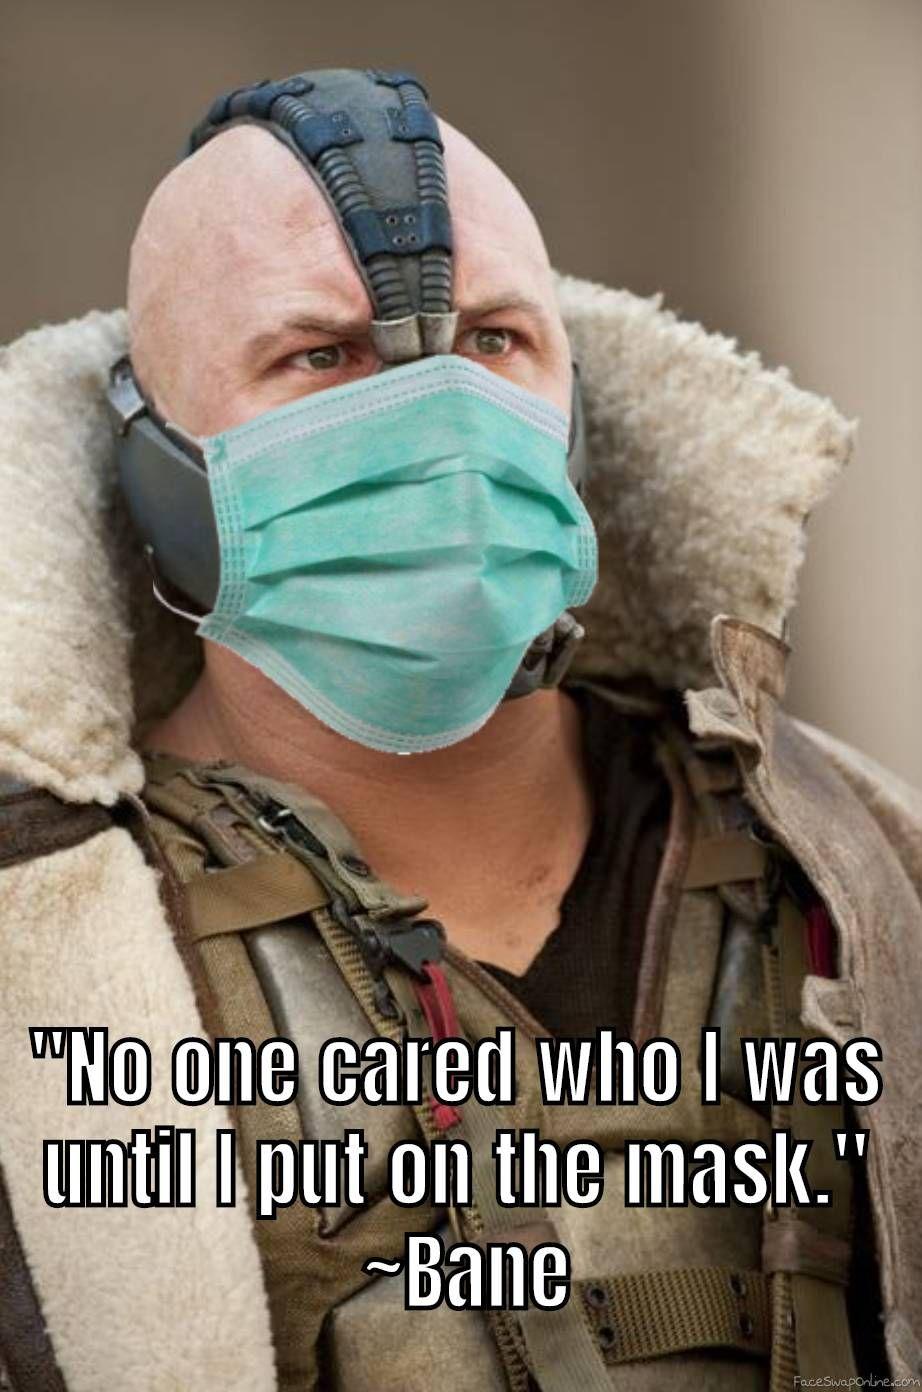 Bane Mask in 2020 Bane mask, Face swaps, Bane